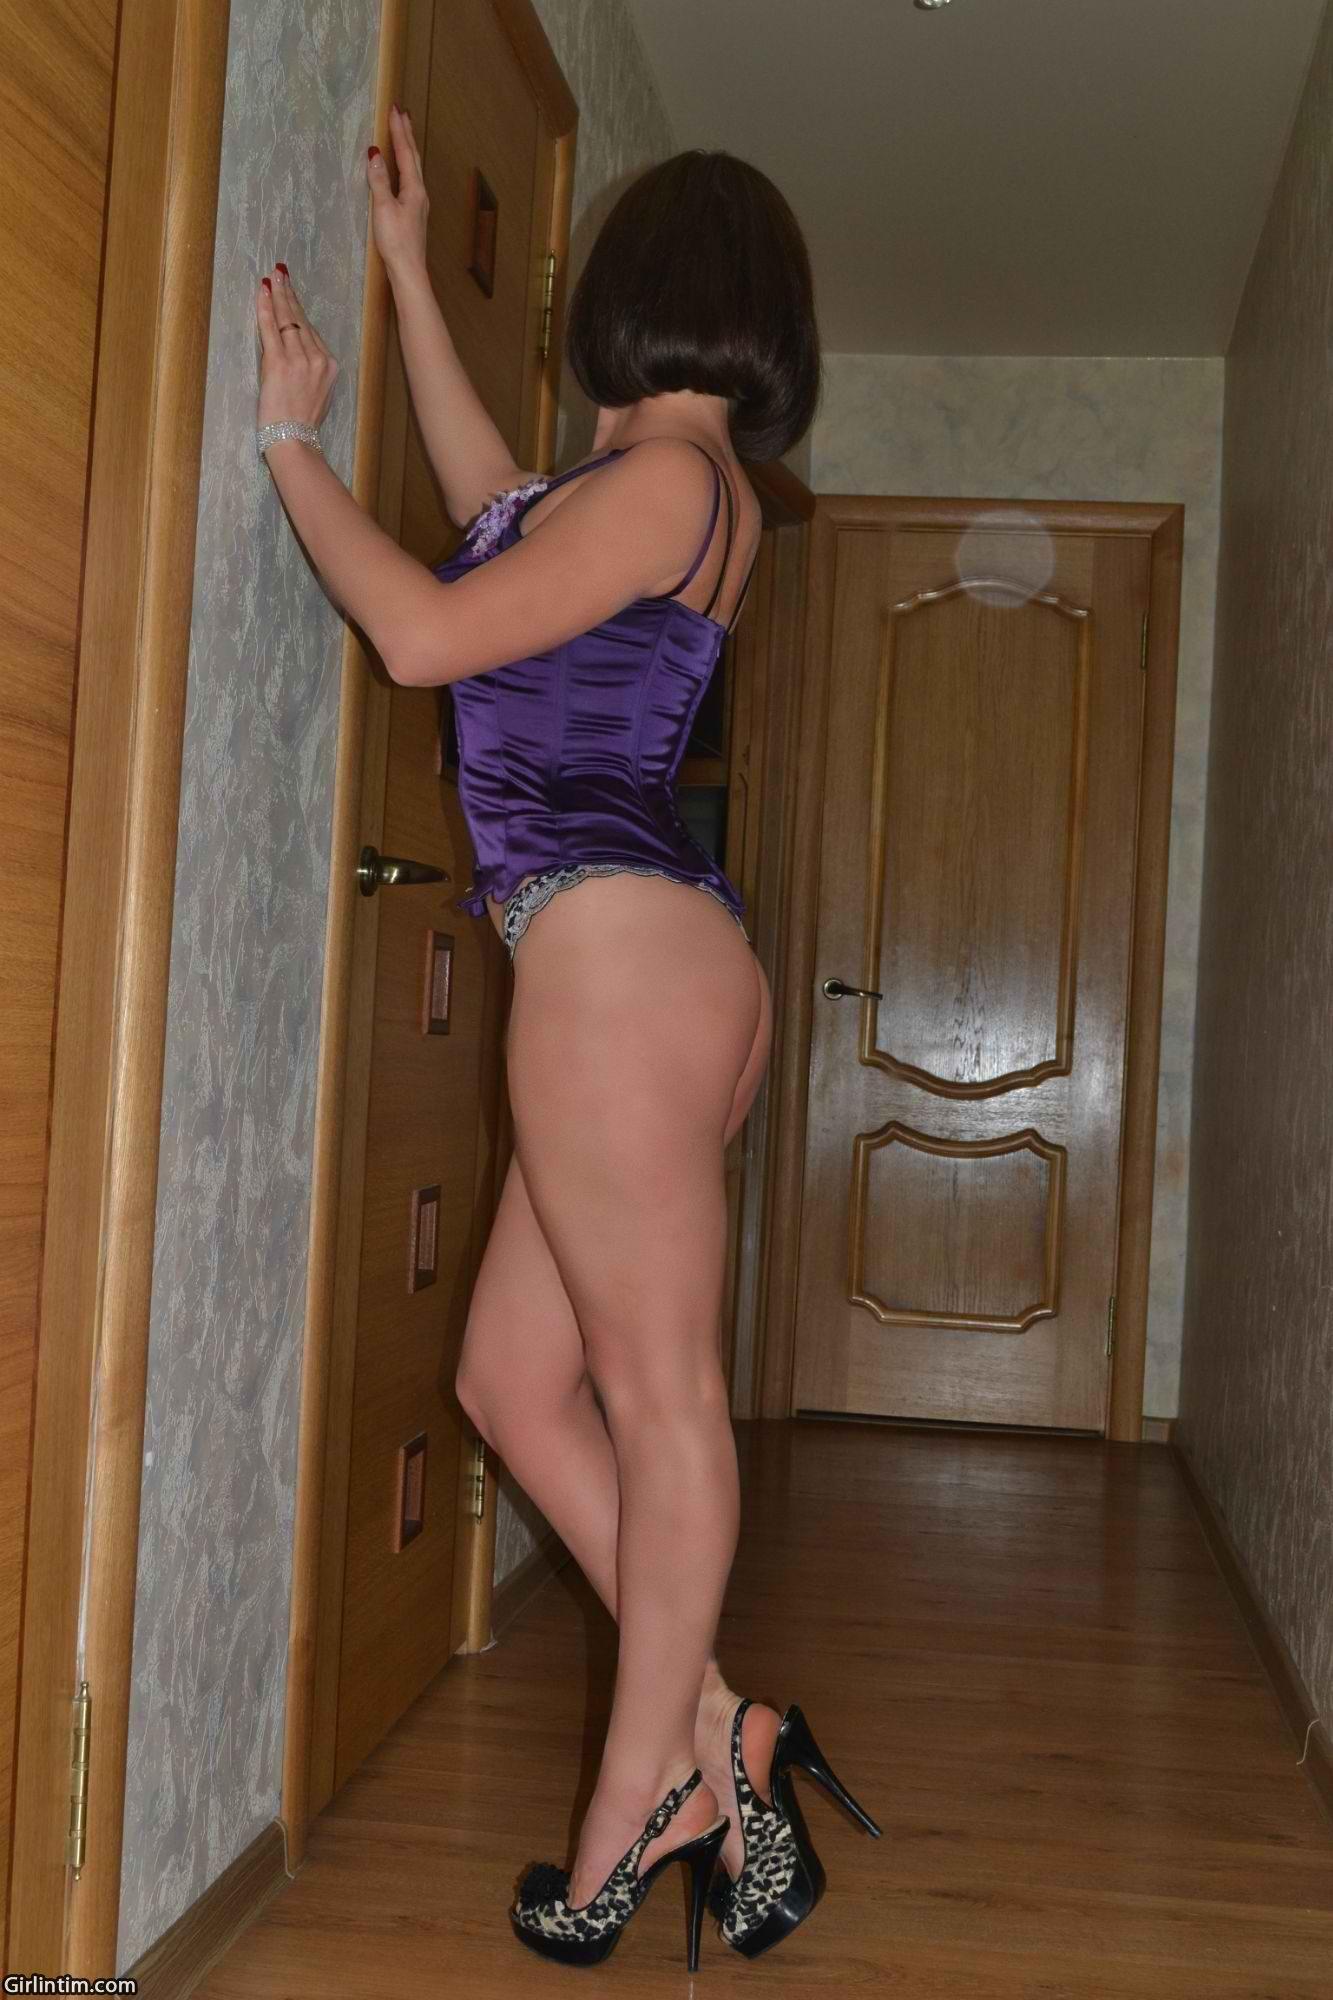 Индивидуалки в сао проститутки г тихорецка